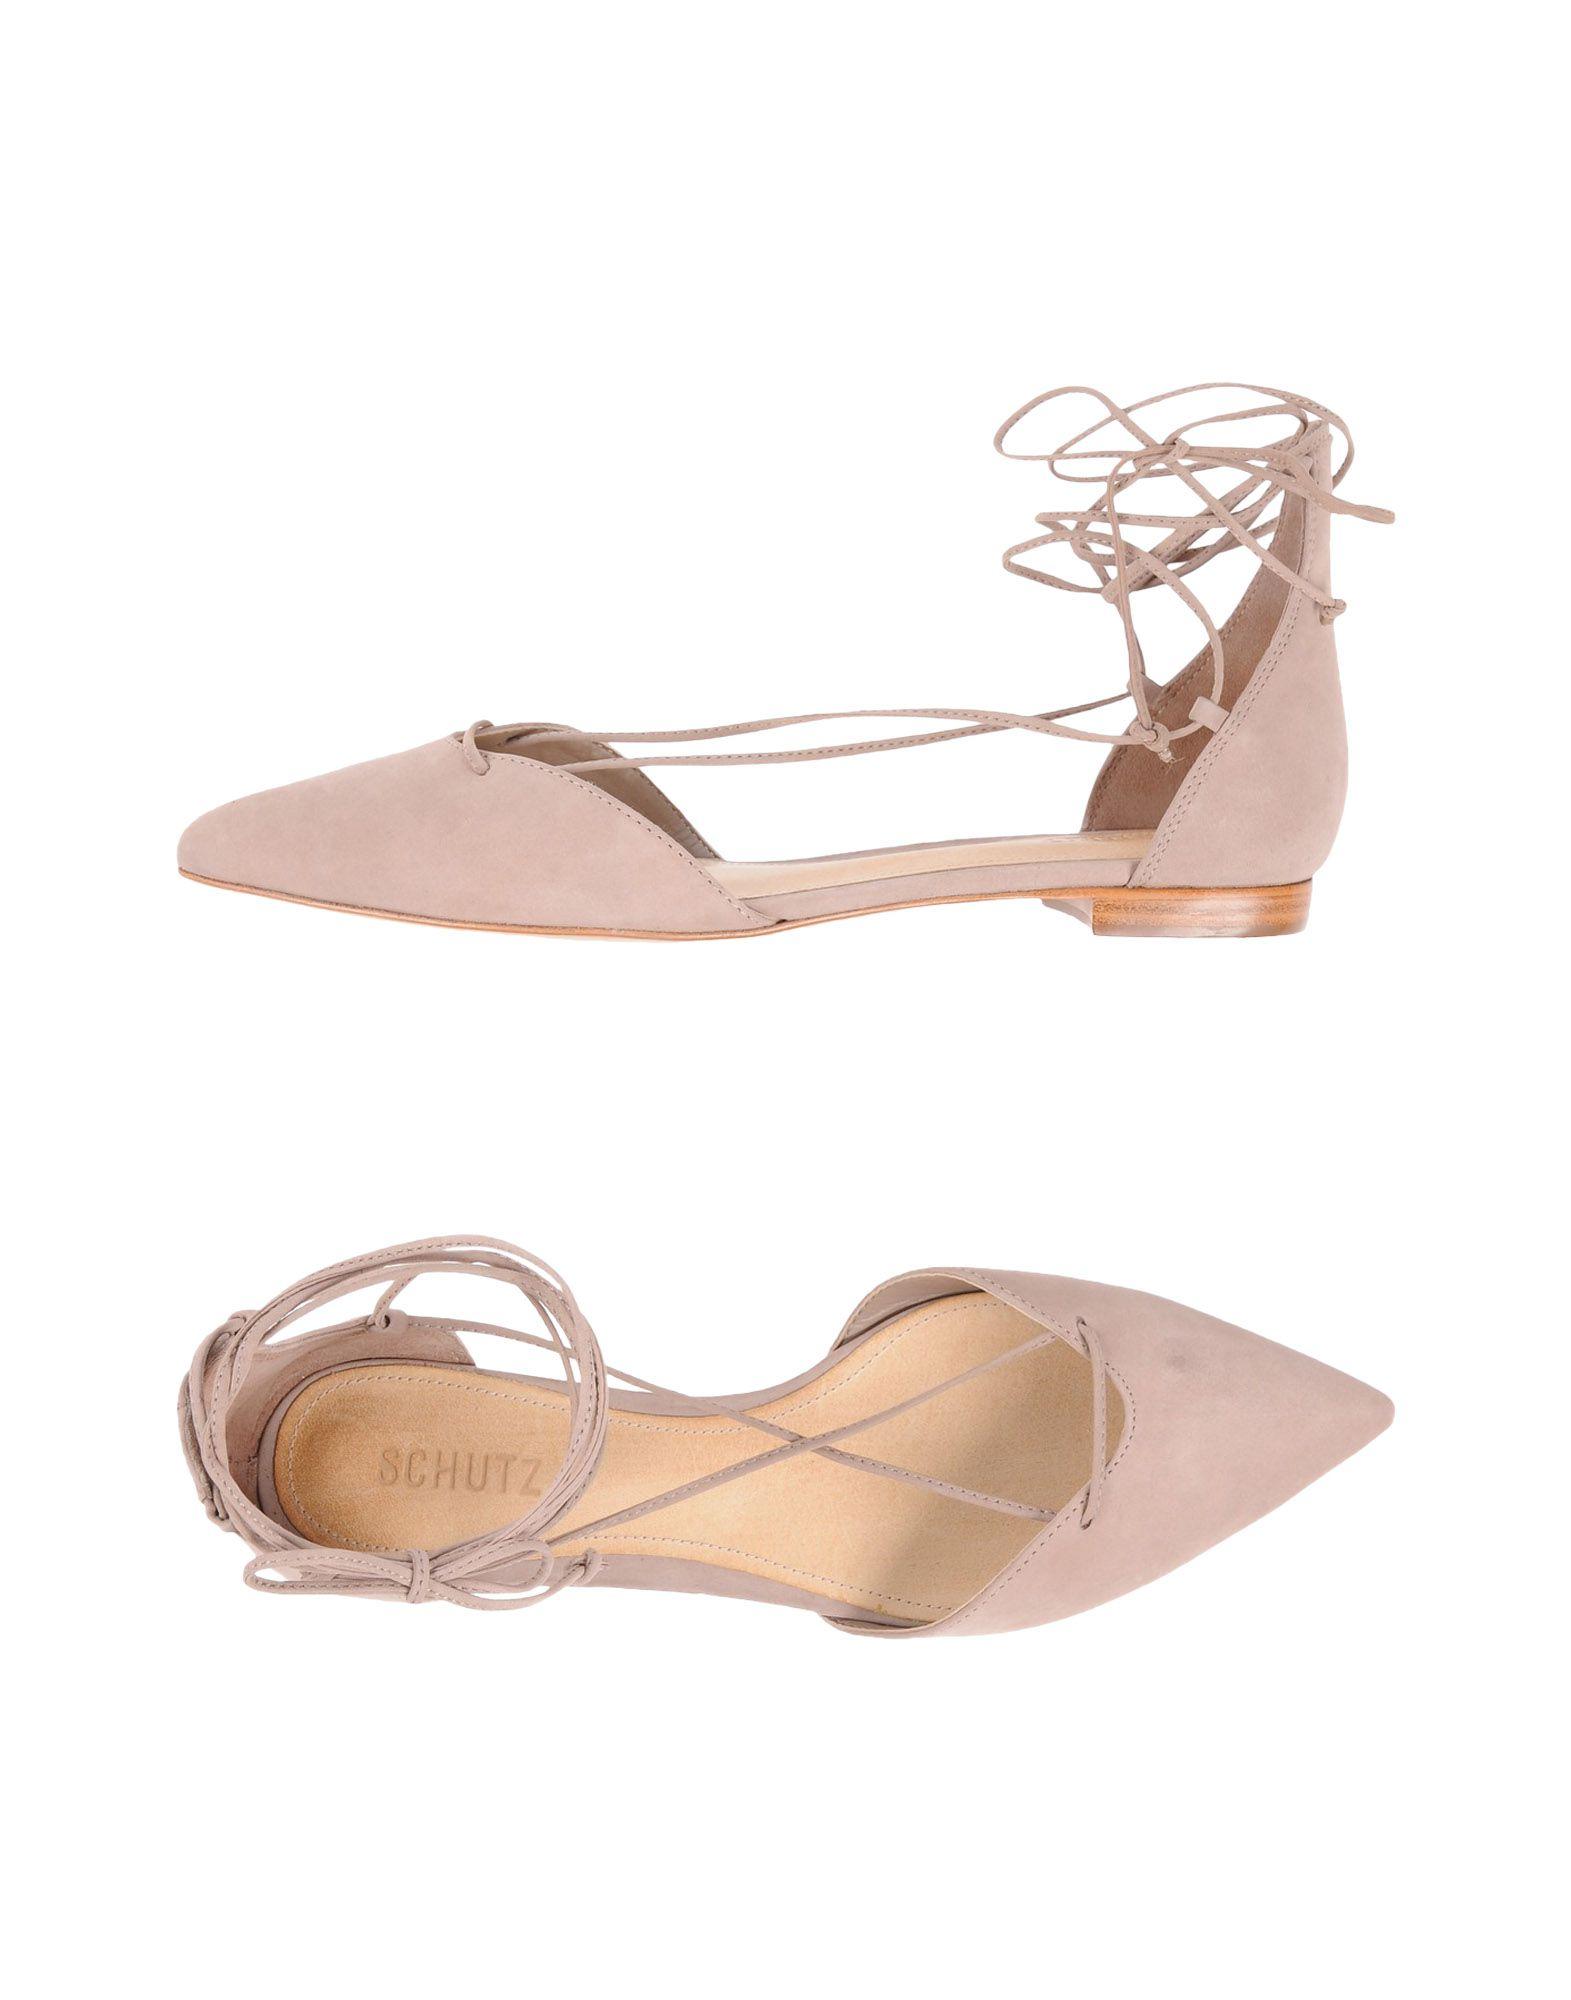 Schutz Ballet Flats - Women Schutz  Ballet Flats online on  Schutz Australia - 11434494MS 9ca002